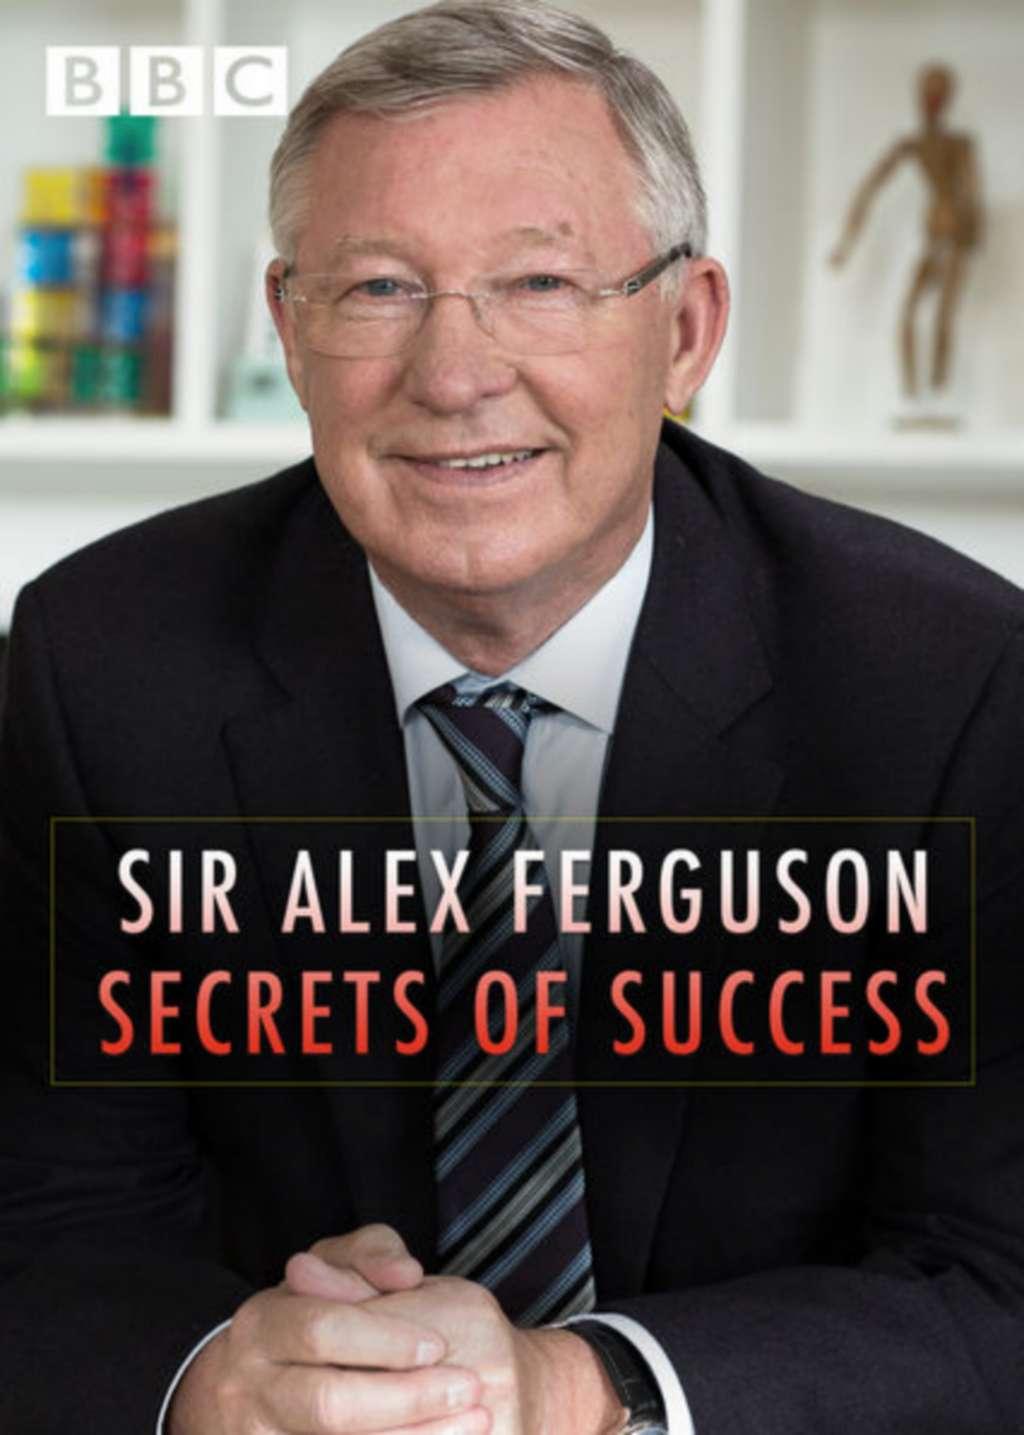 Sir Alex Ferguson: Secrets of Success kapak